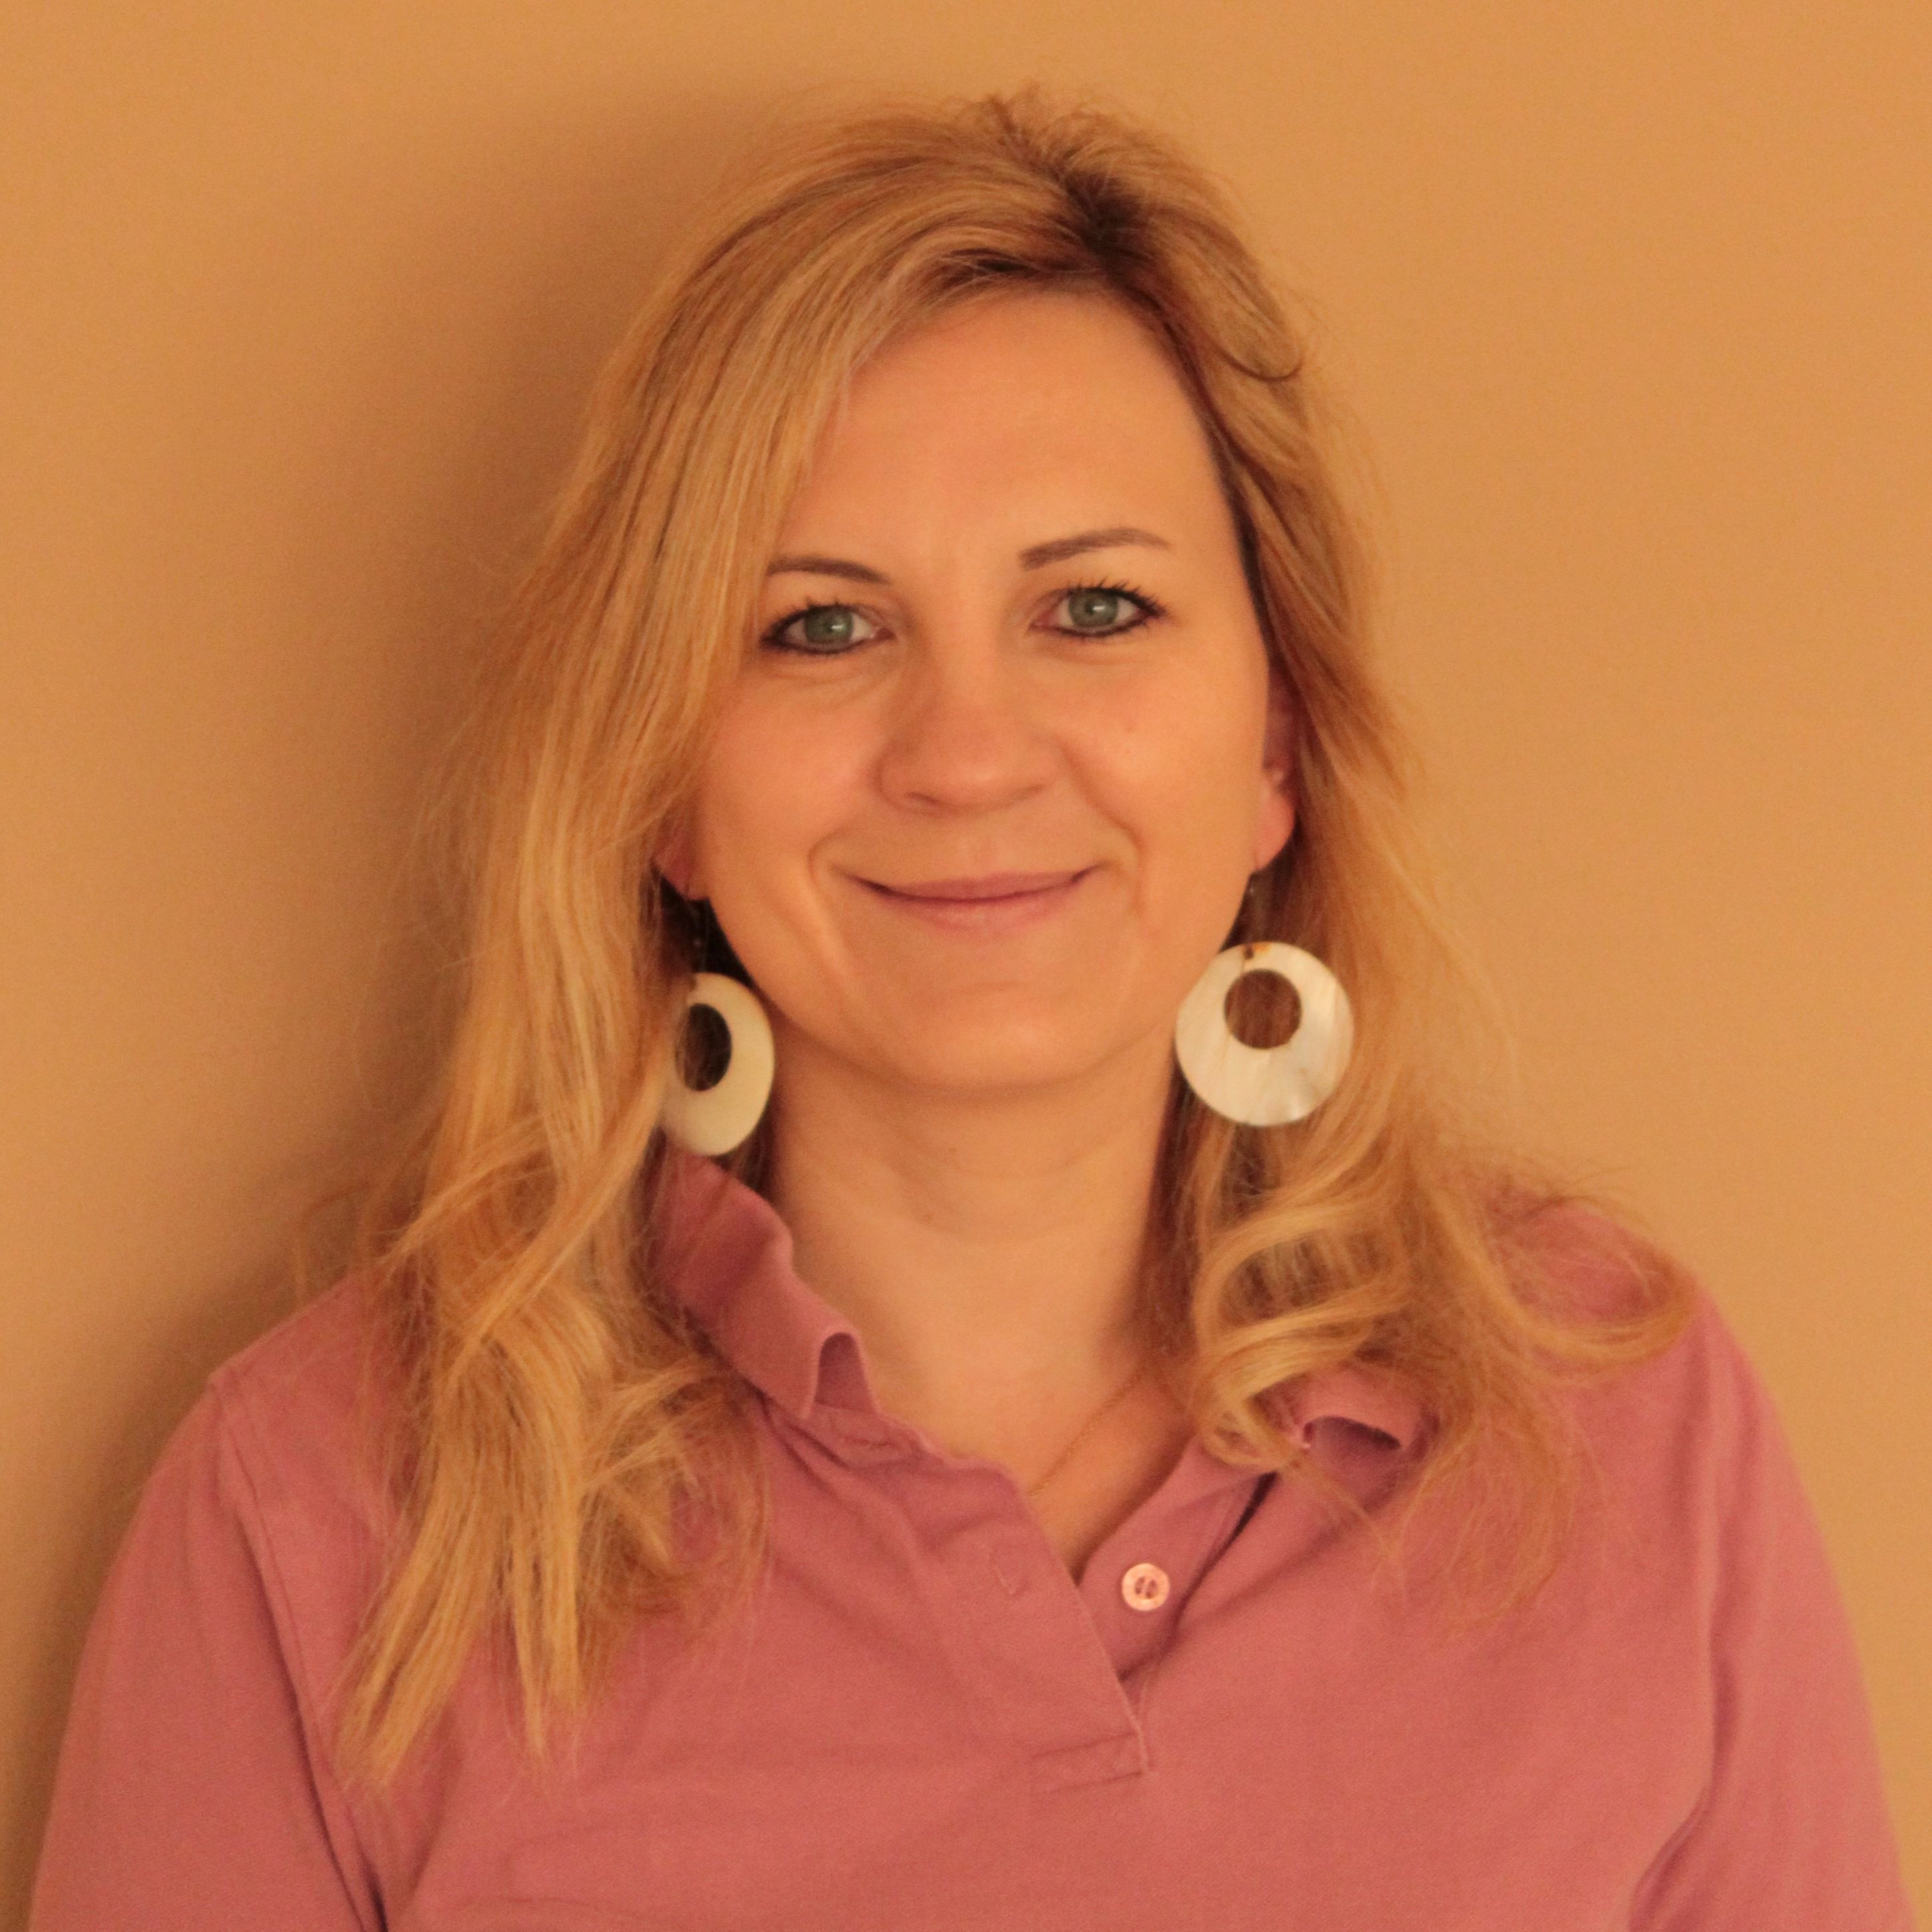 Tanja Schreindorfer